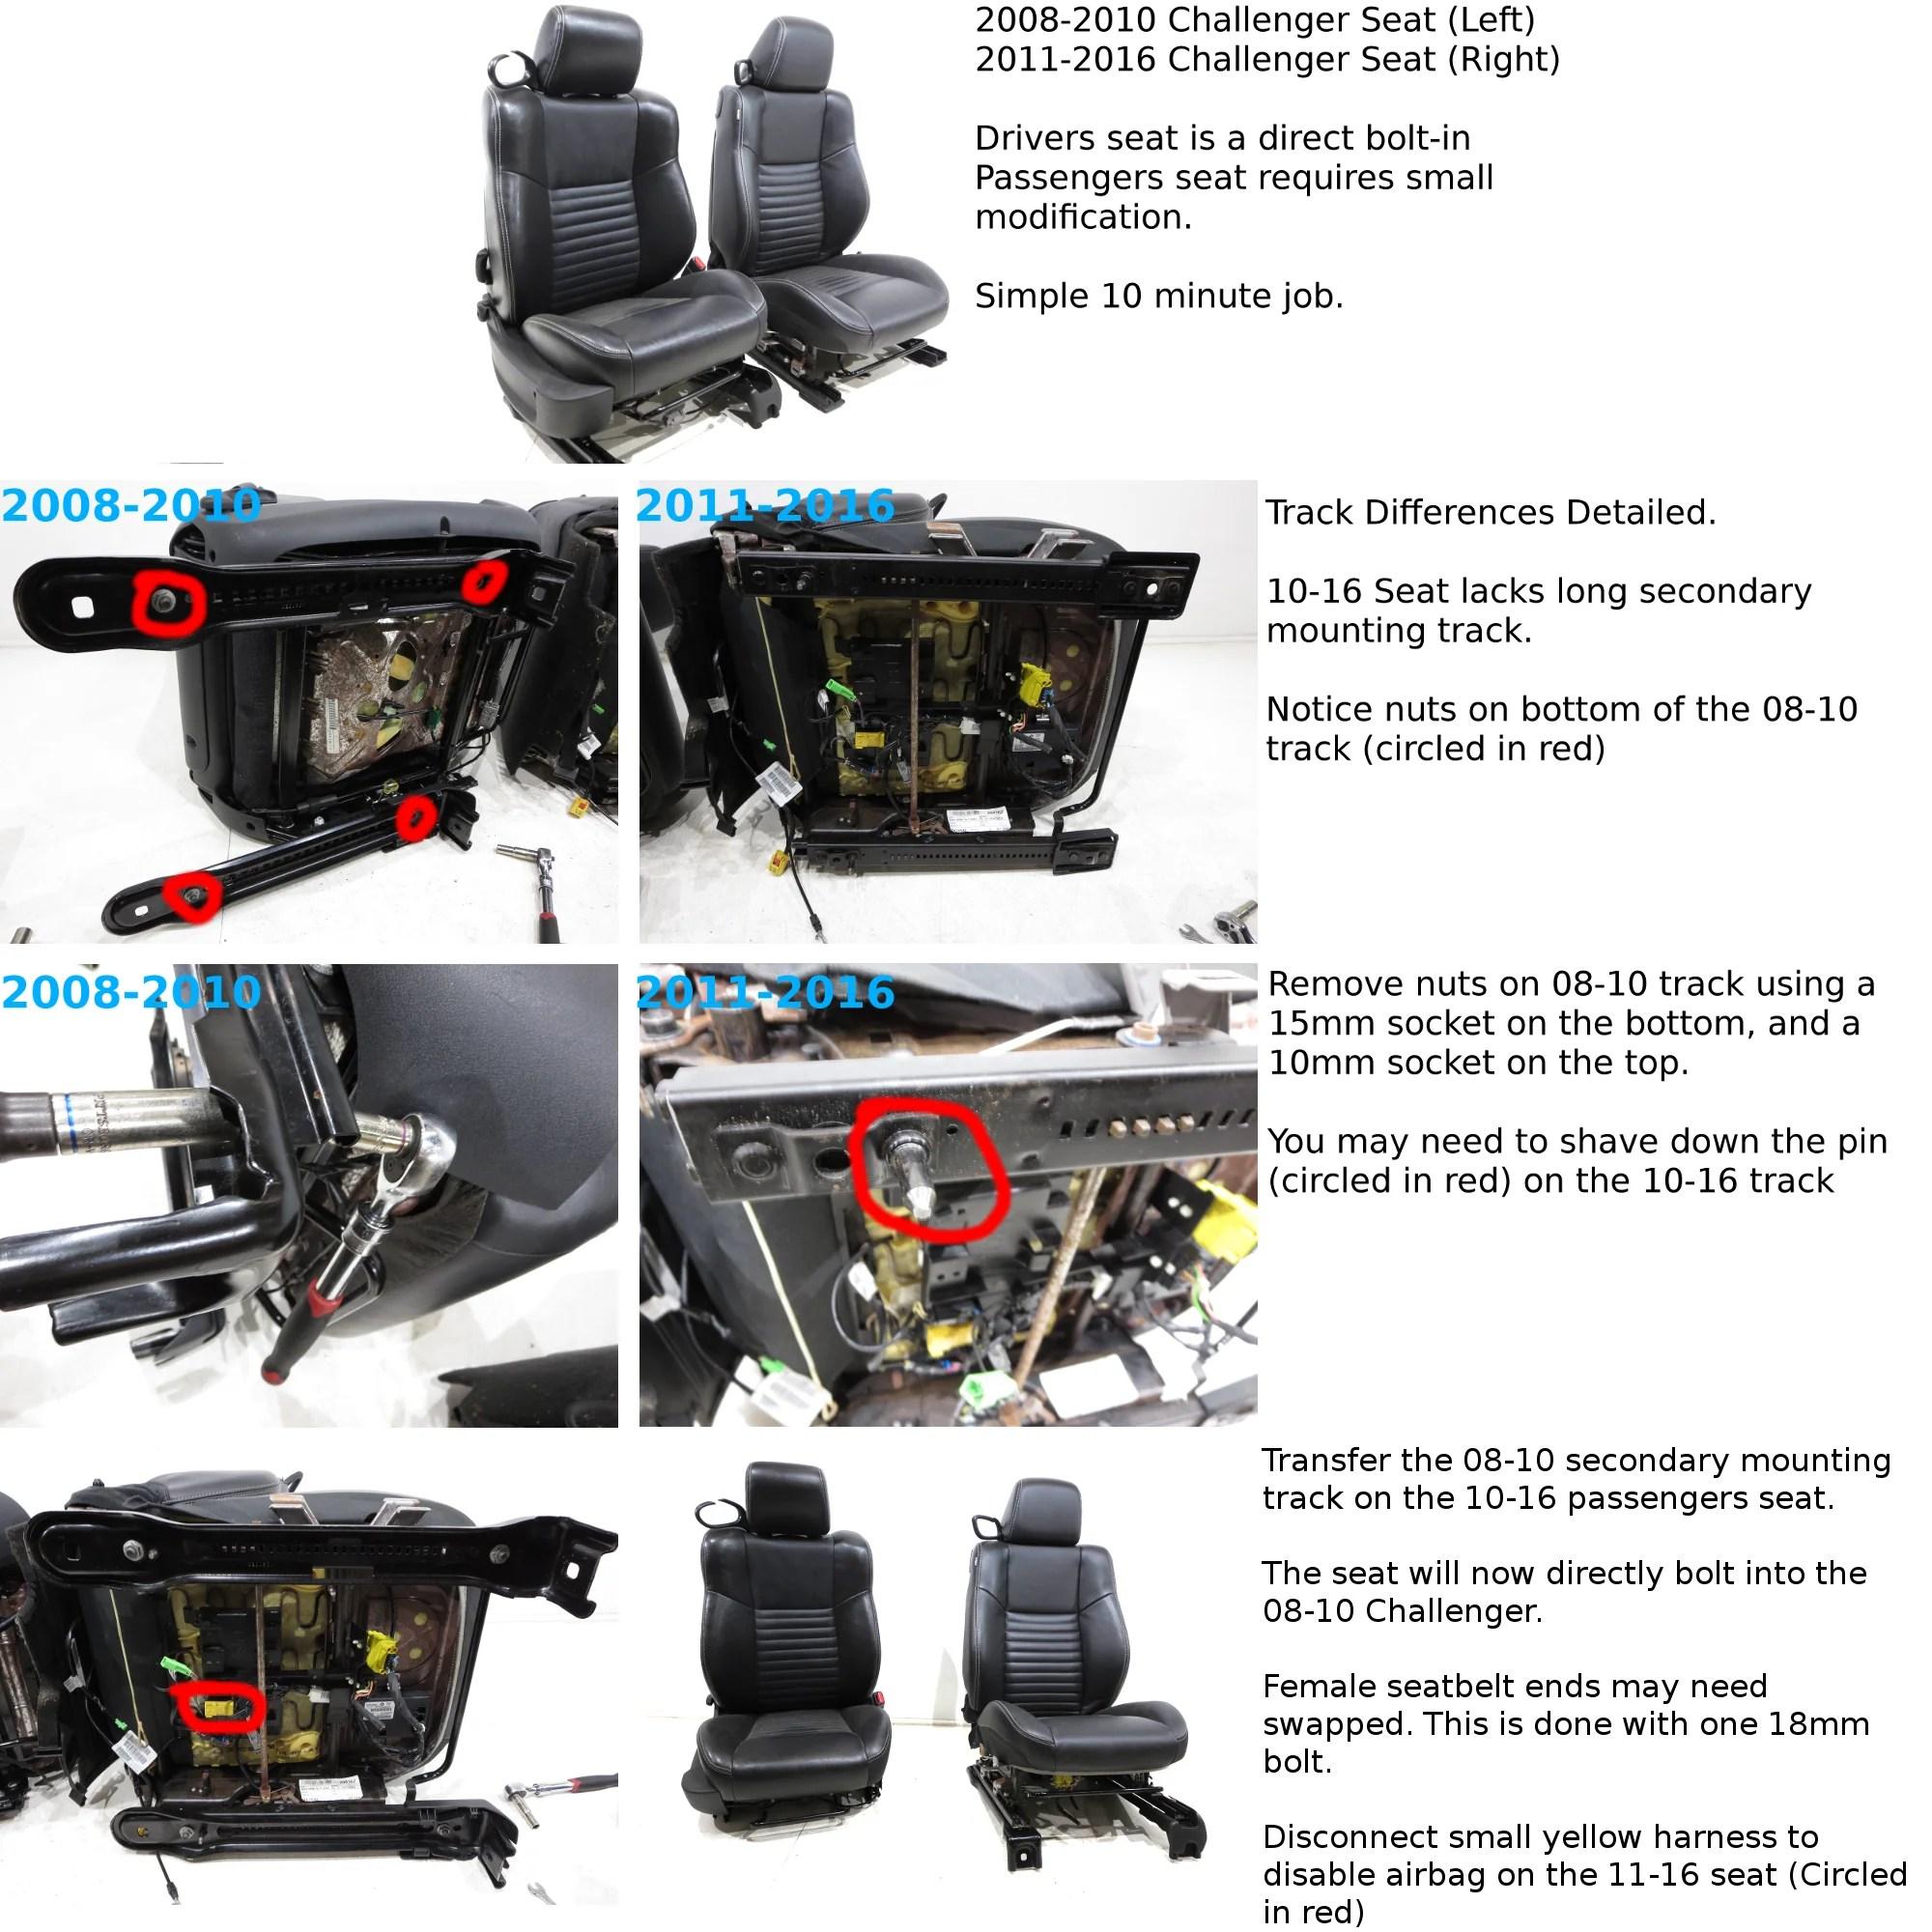 Dodge Challenger Seat Wiring Diagram Diy Enthusiasts Diagrams 1973 2010 Rh Airfreshener Club Motorhome